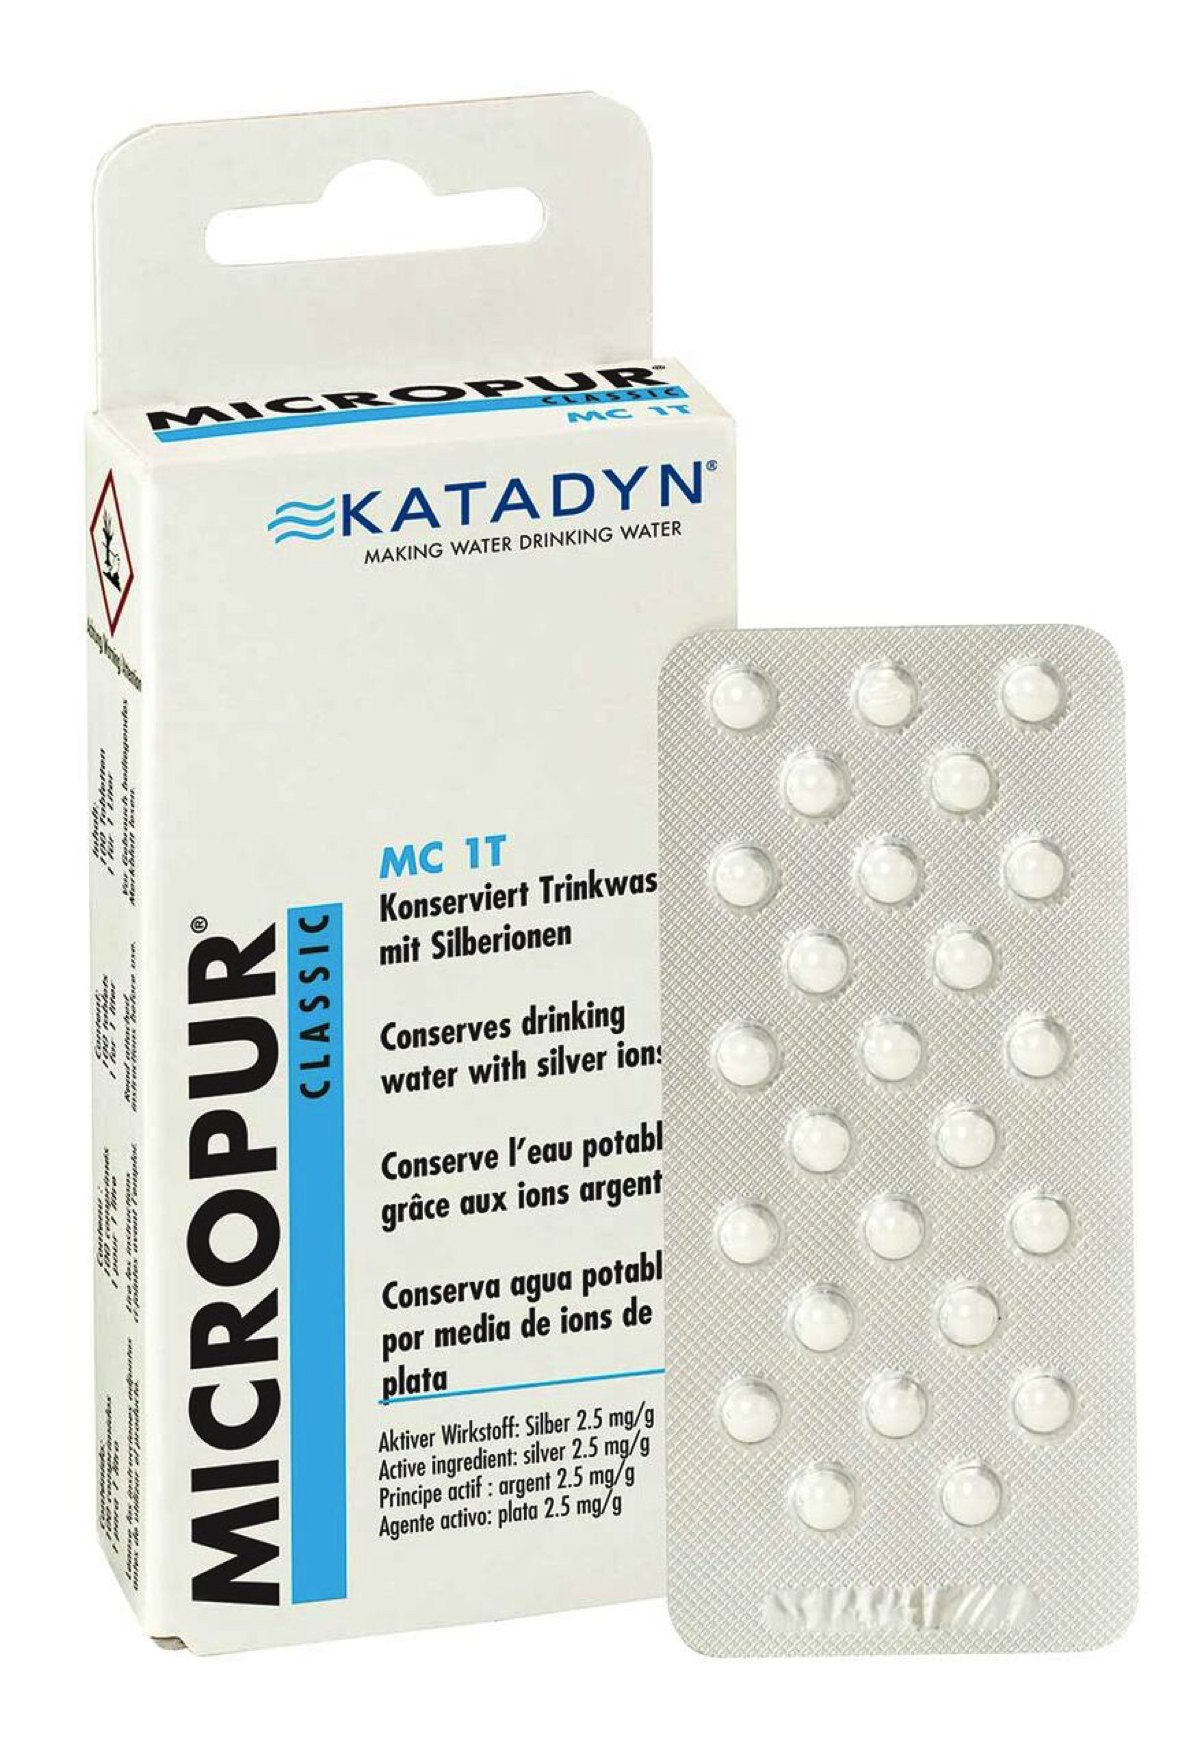 Katadyn - Micropur Classic MC 1T - Desinfección del agua